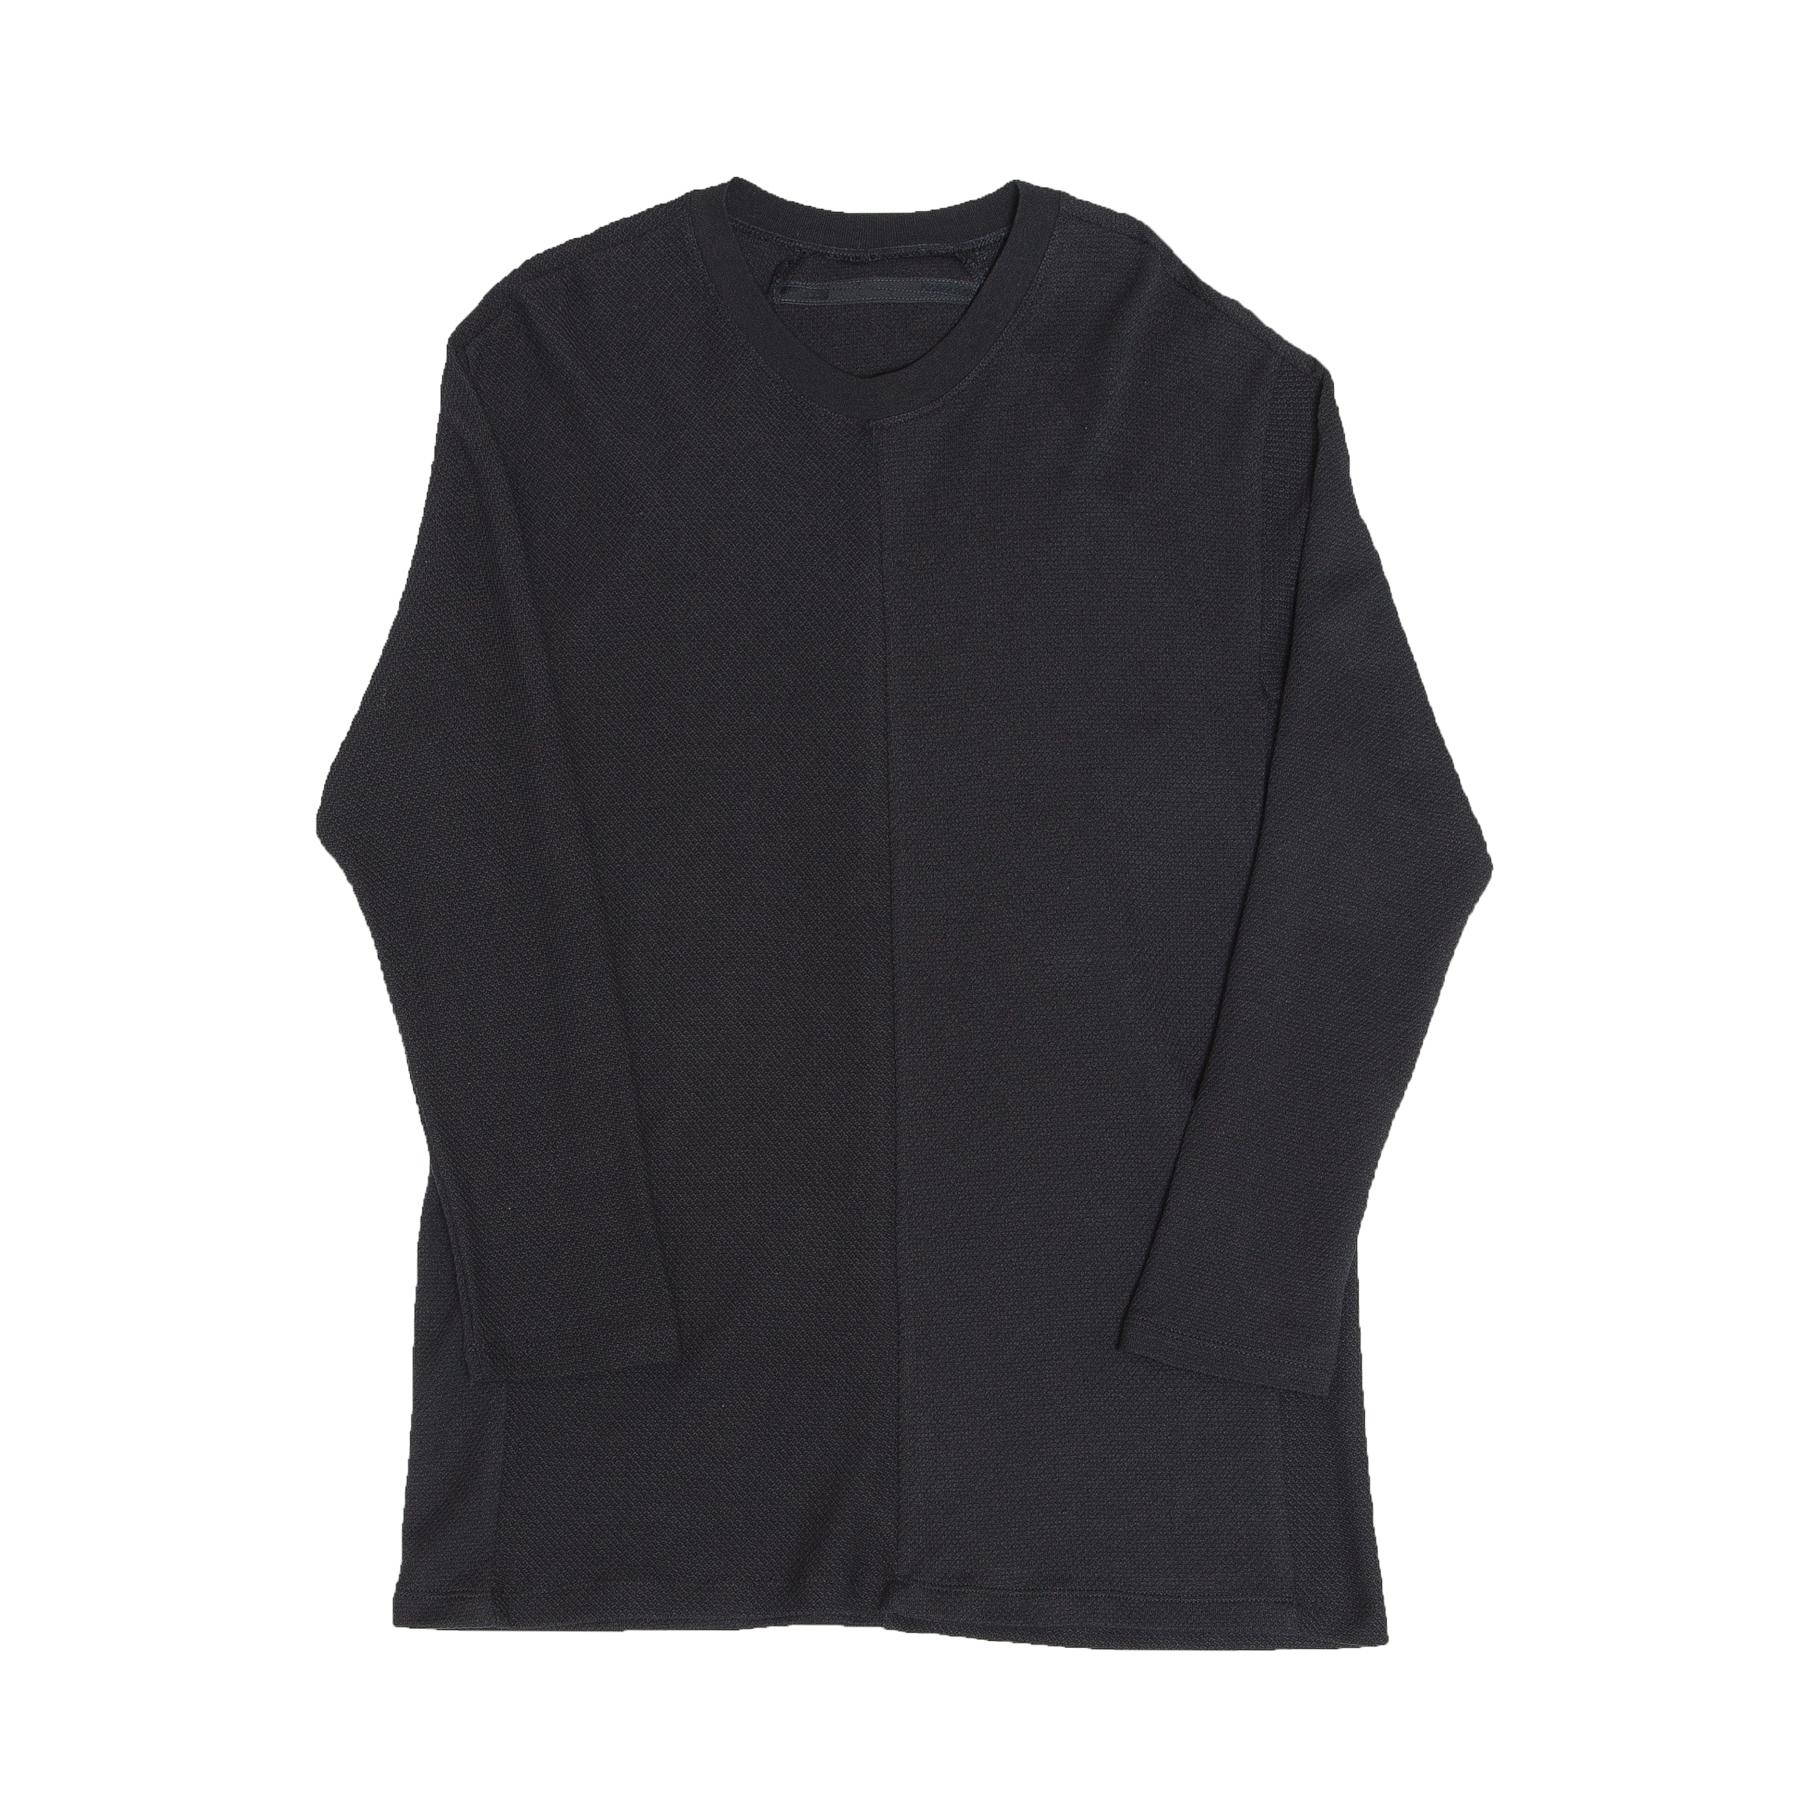 620CUM9-BLACK / クルーネックT-シャツ ver.2